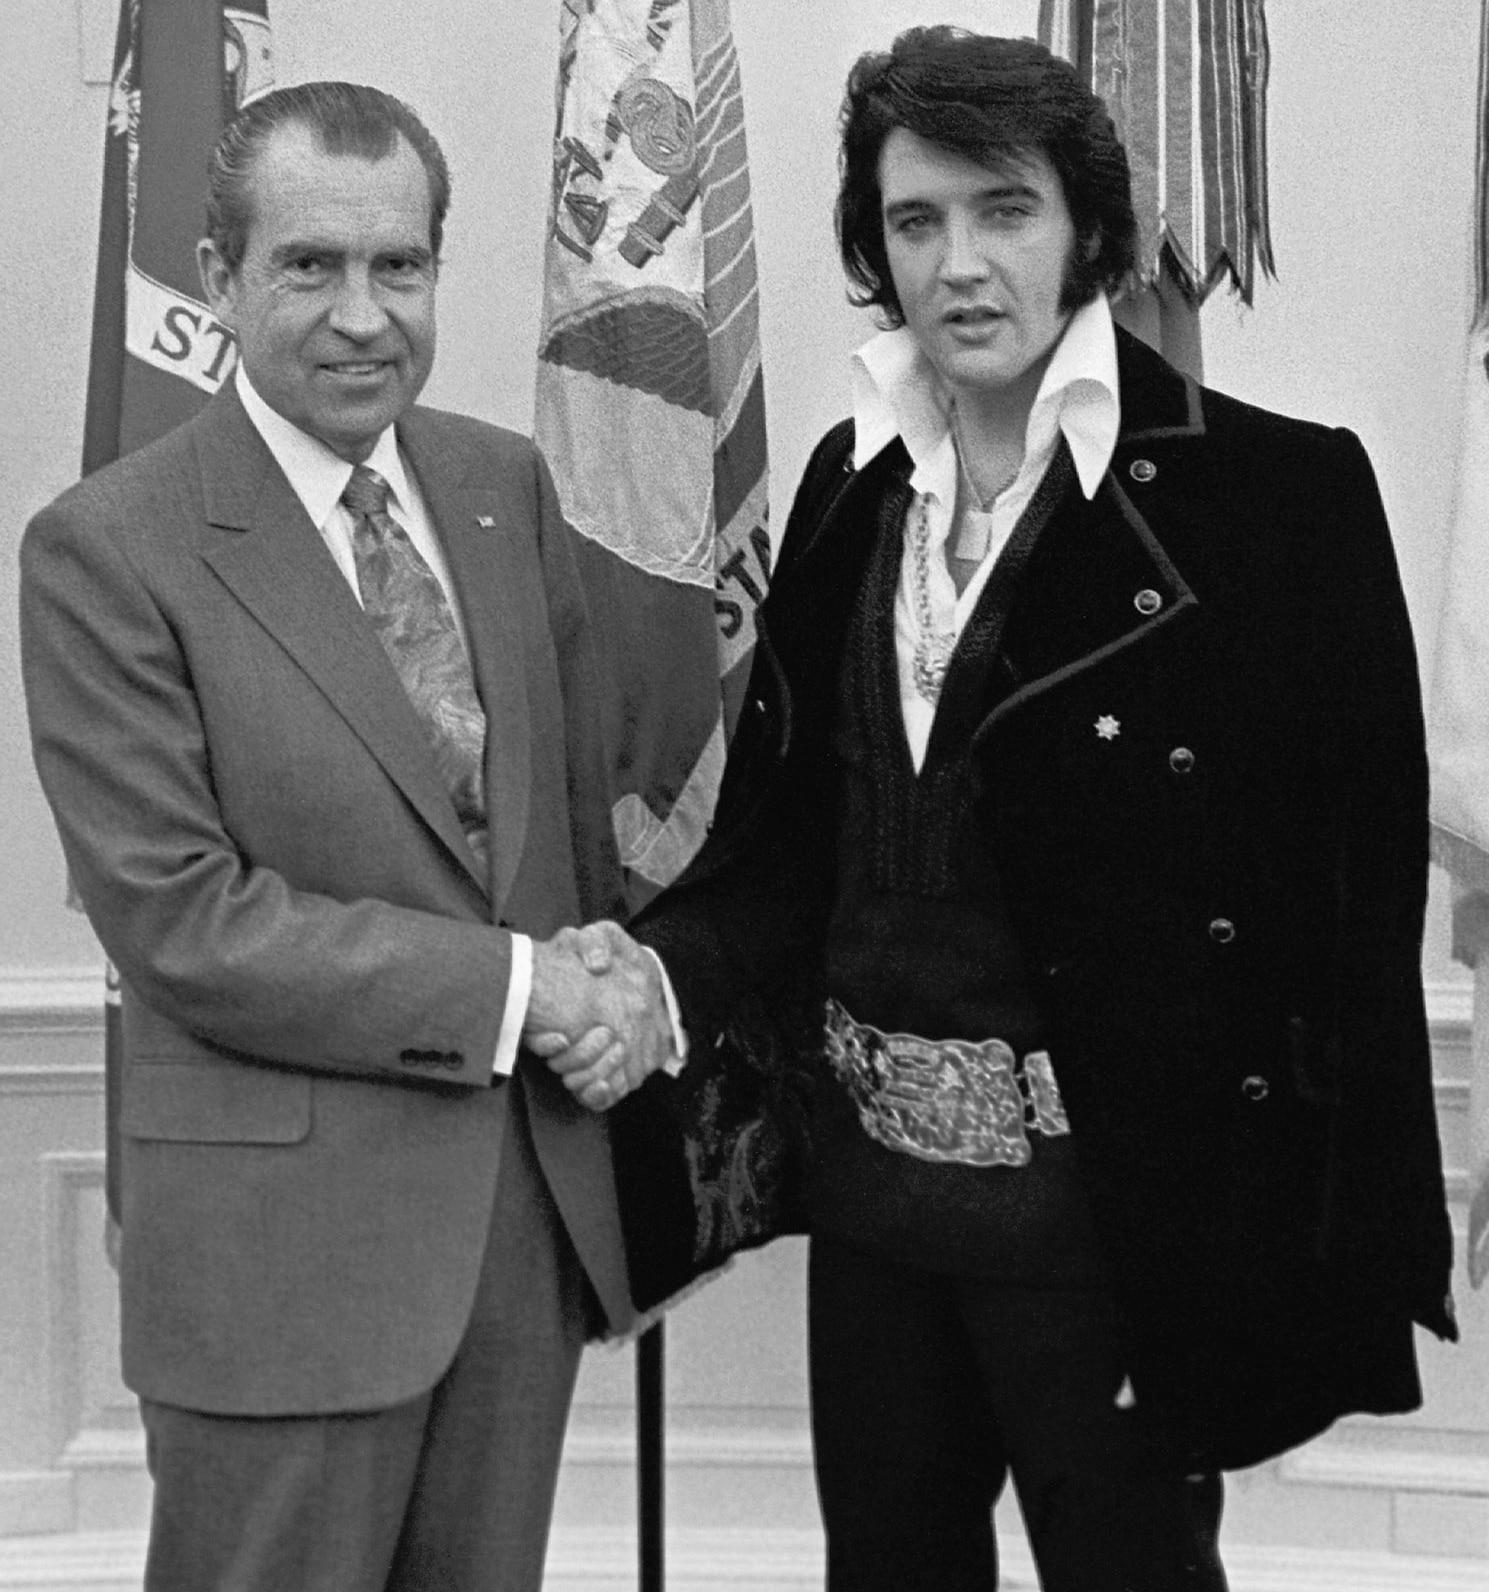 Elvis Presley and President Richard Nixon